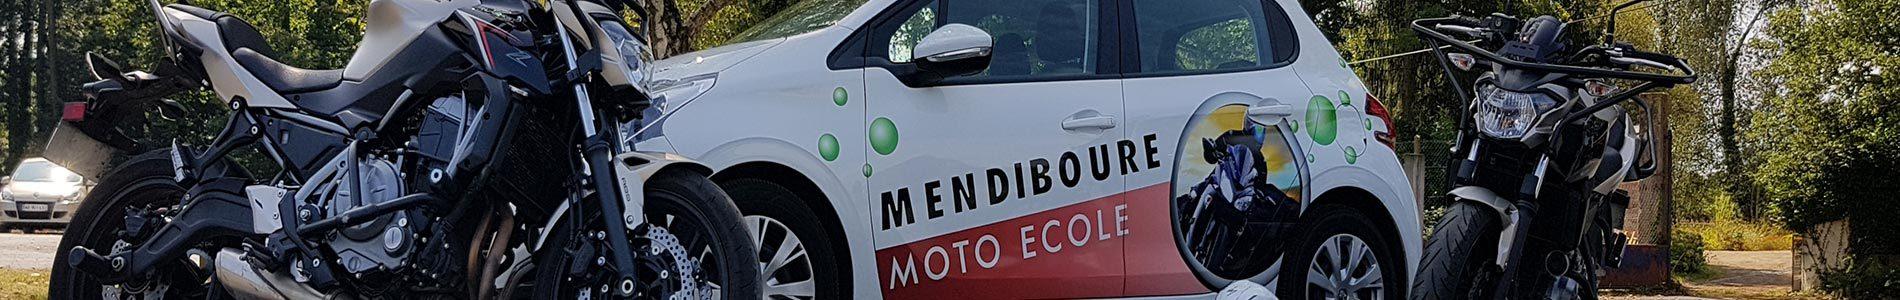 Mendiboure formation - Passerelle A2 vers A